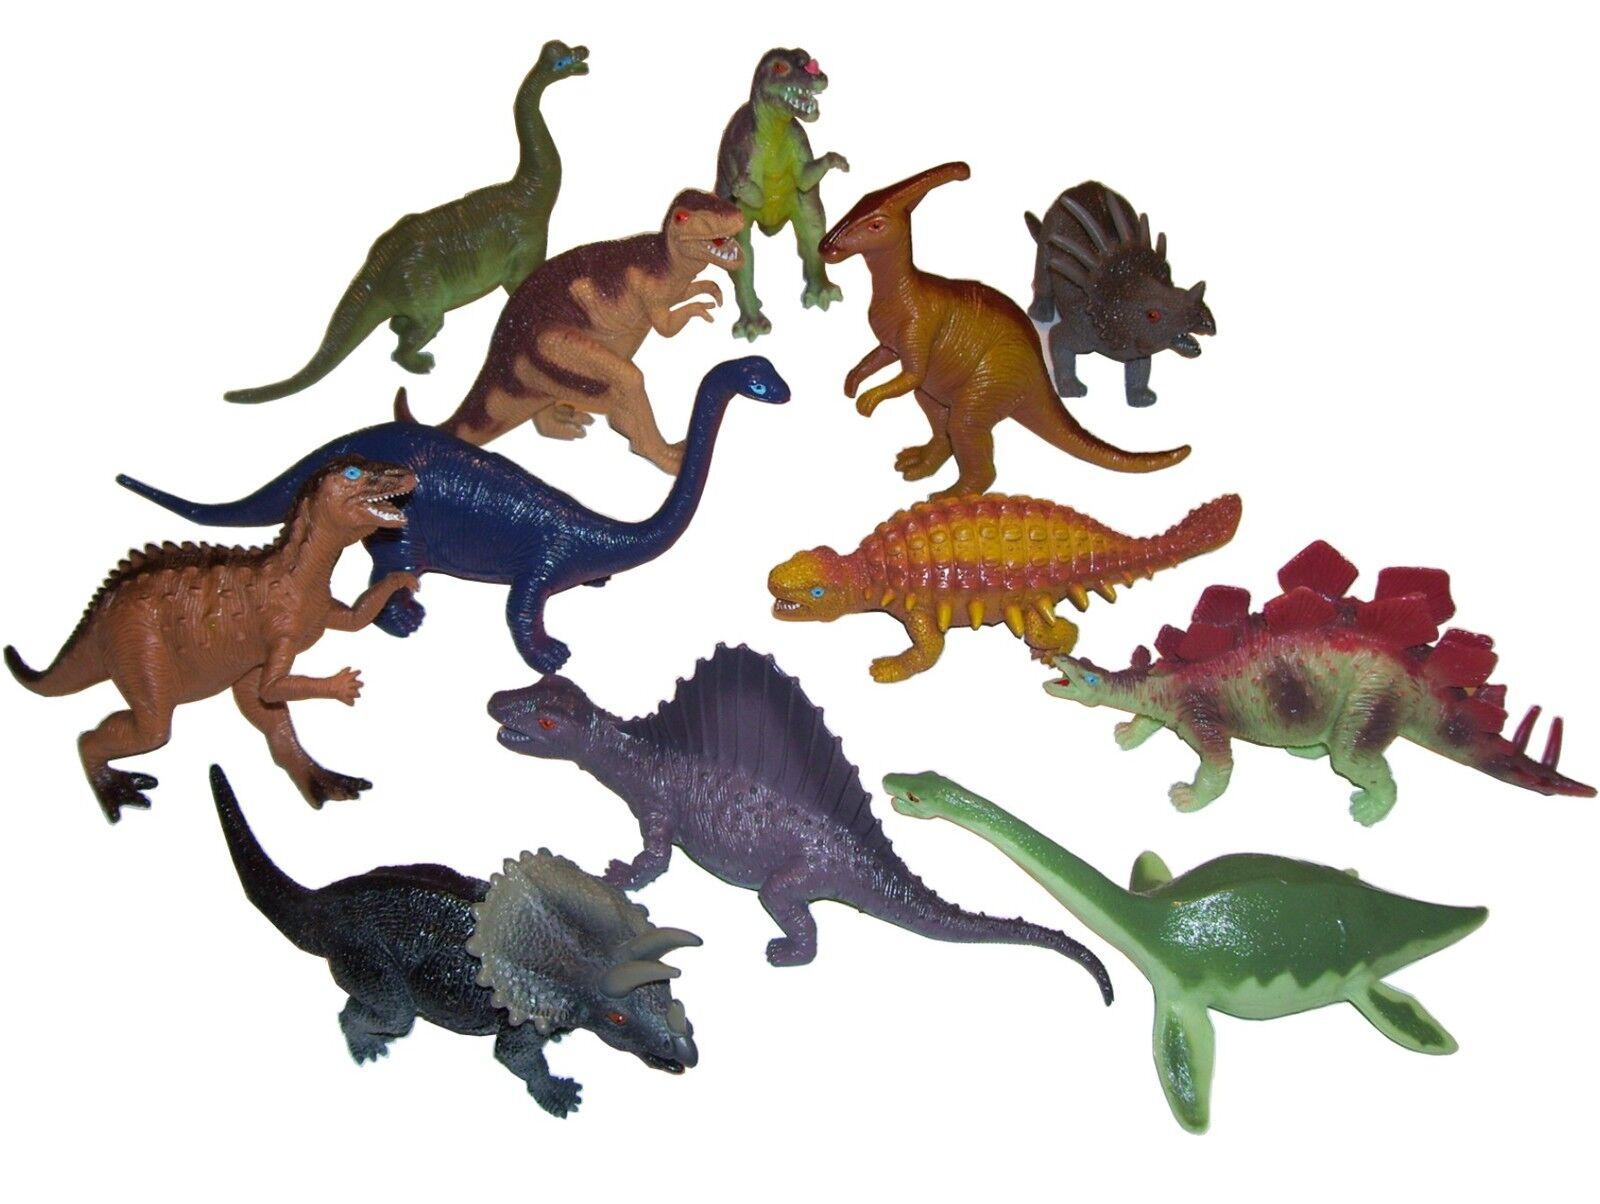 Jurassic Park Dinosaur Toys : Jurassic park dinosaur toys bing images